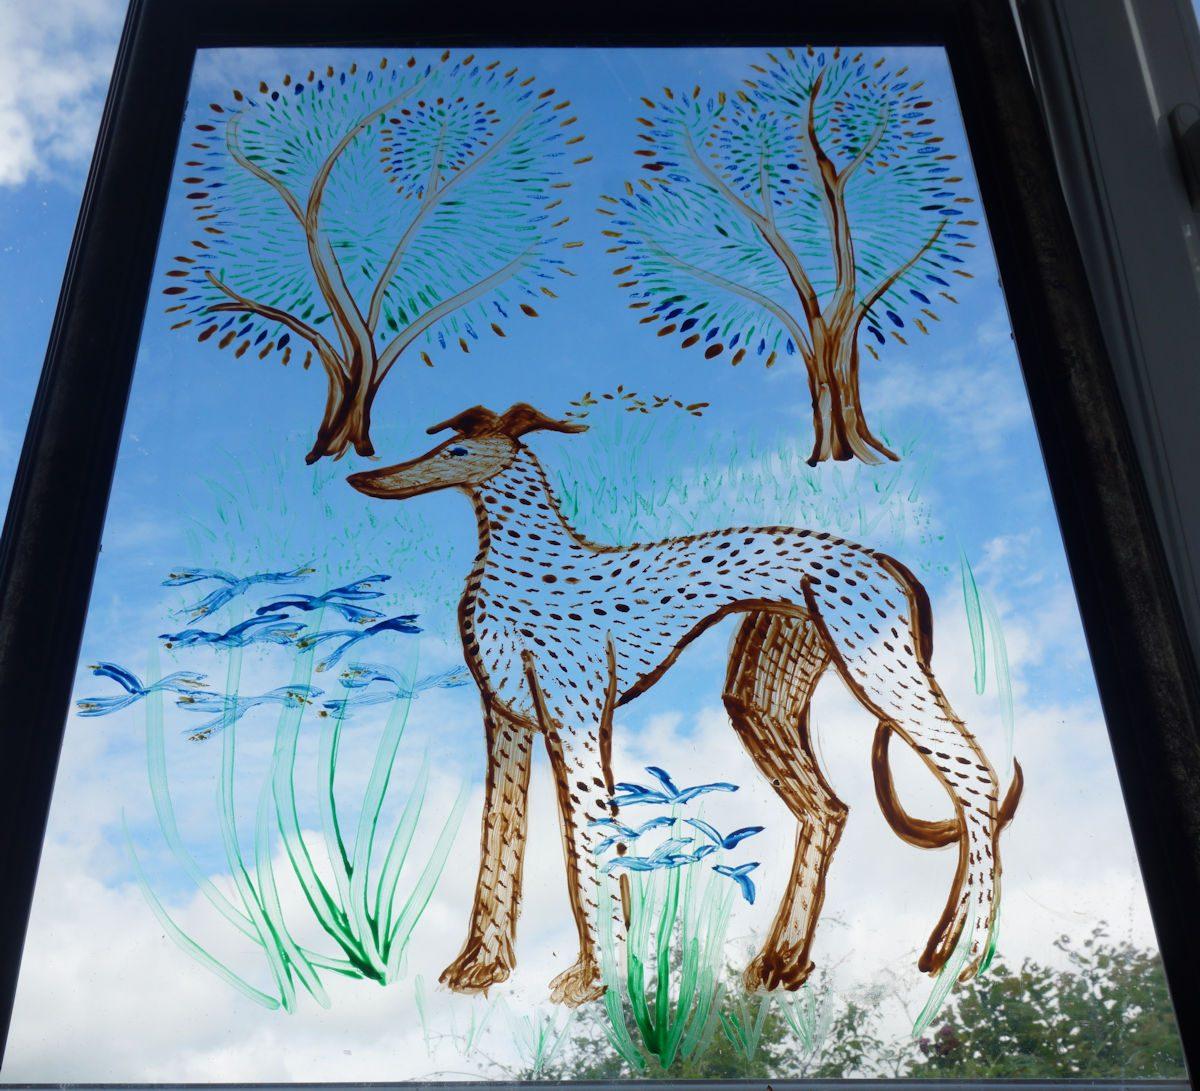 Painting on Perspex